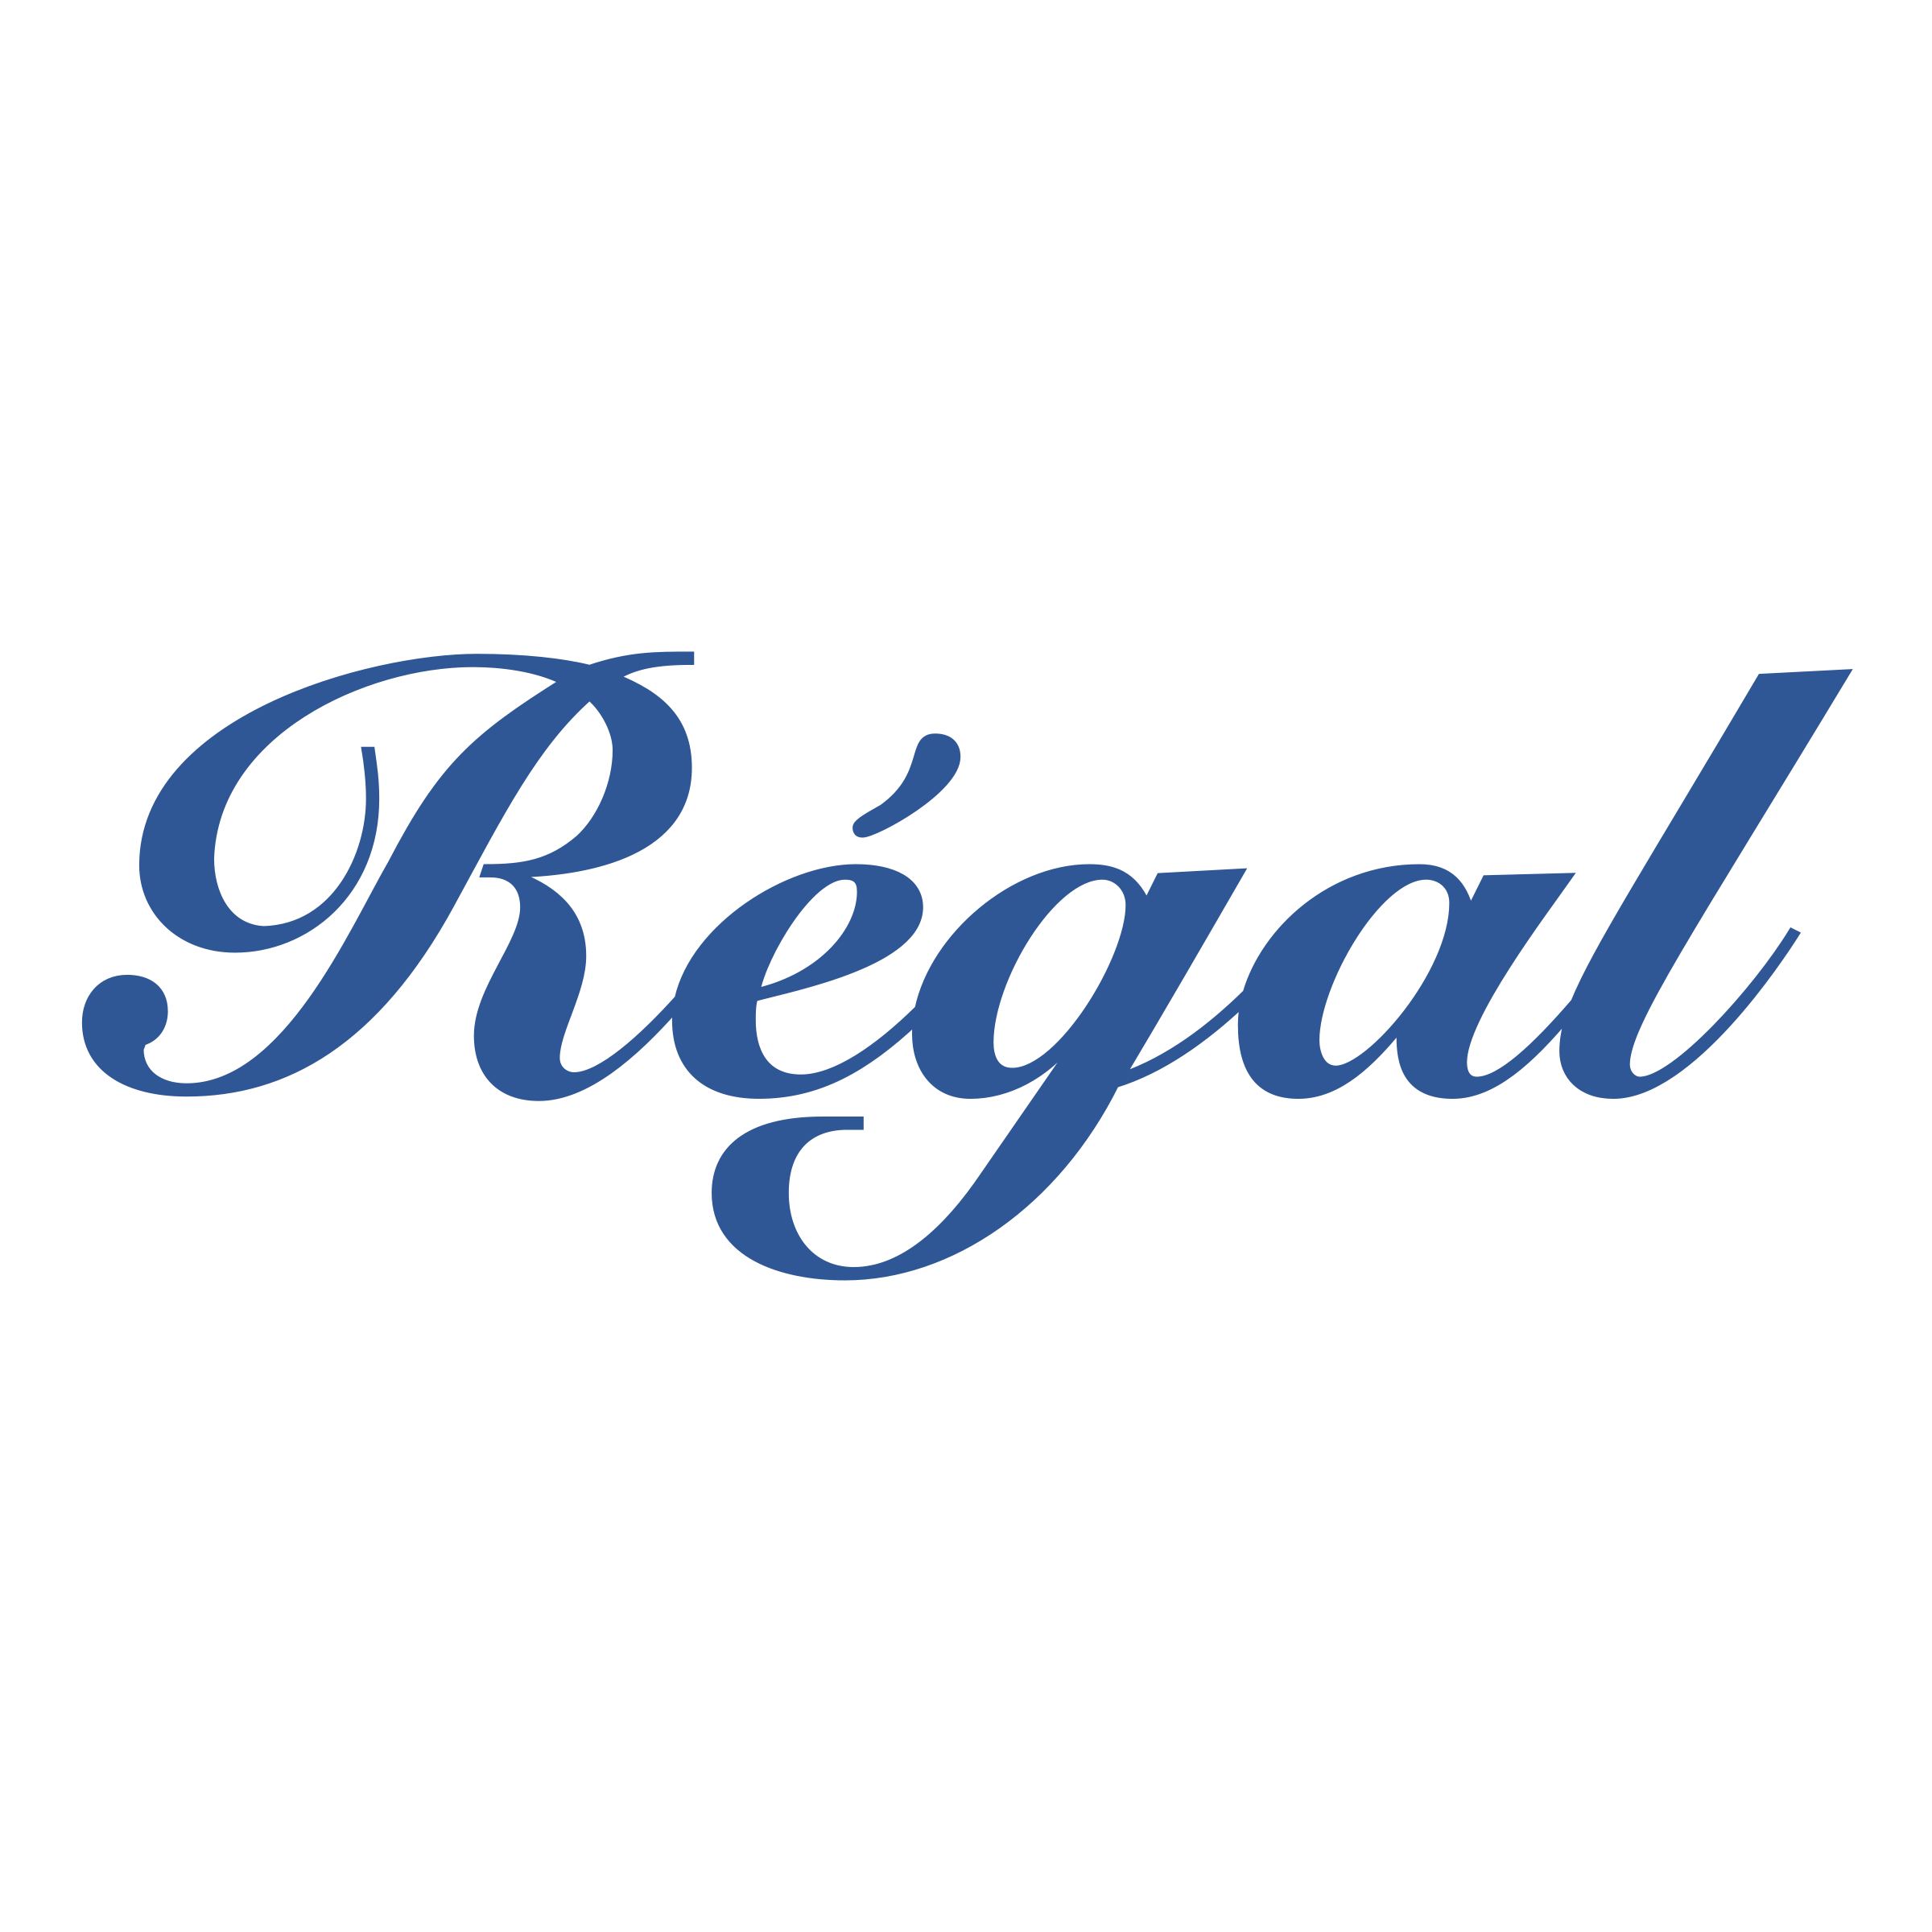 Regal Logo PNG Transparent & SVG Vector.